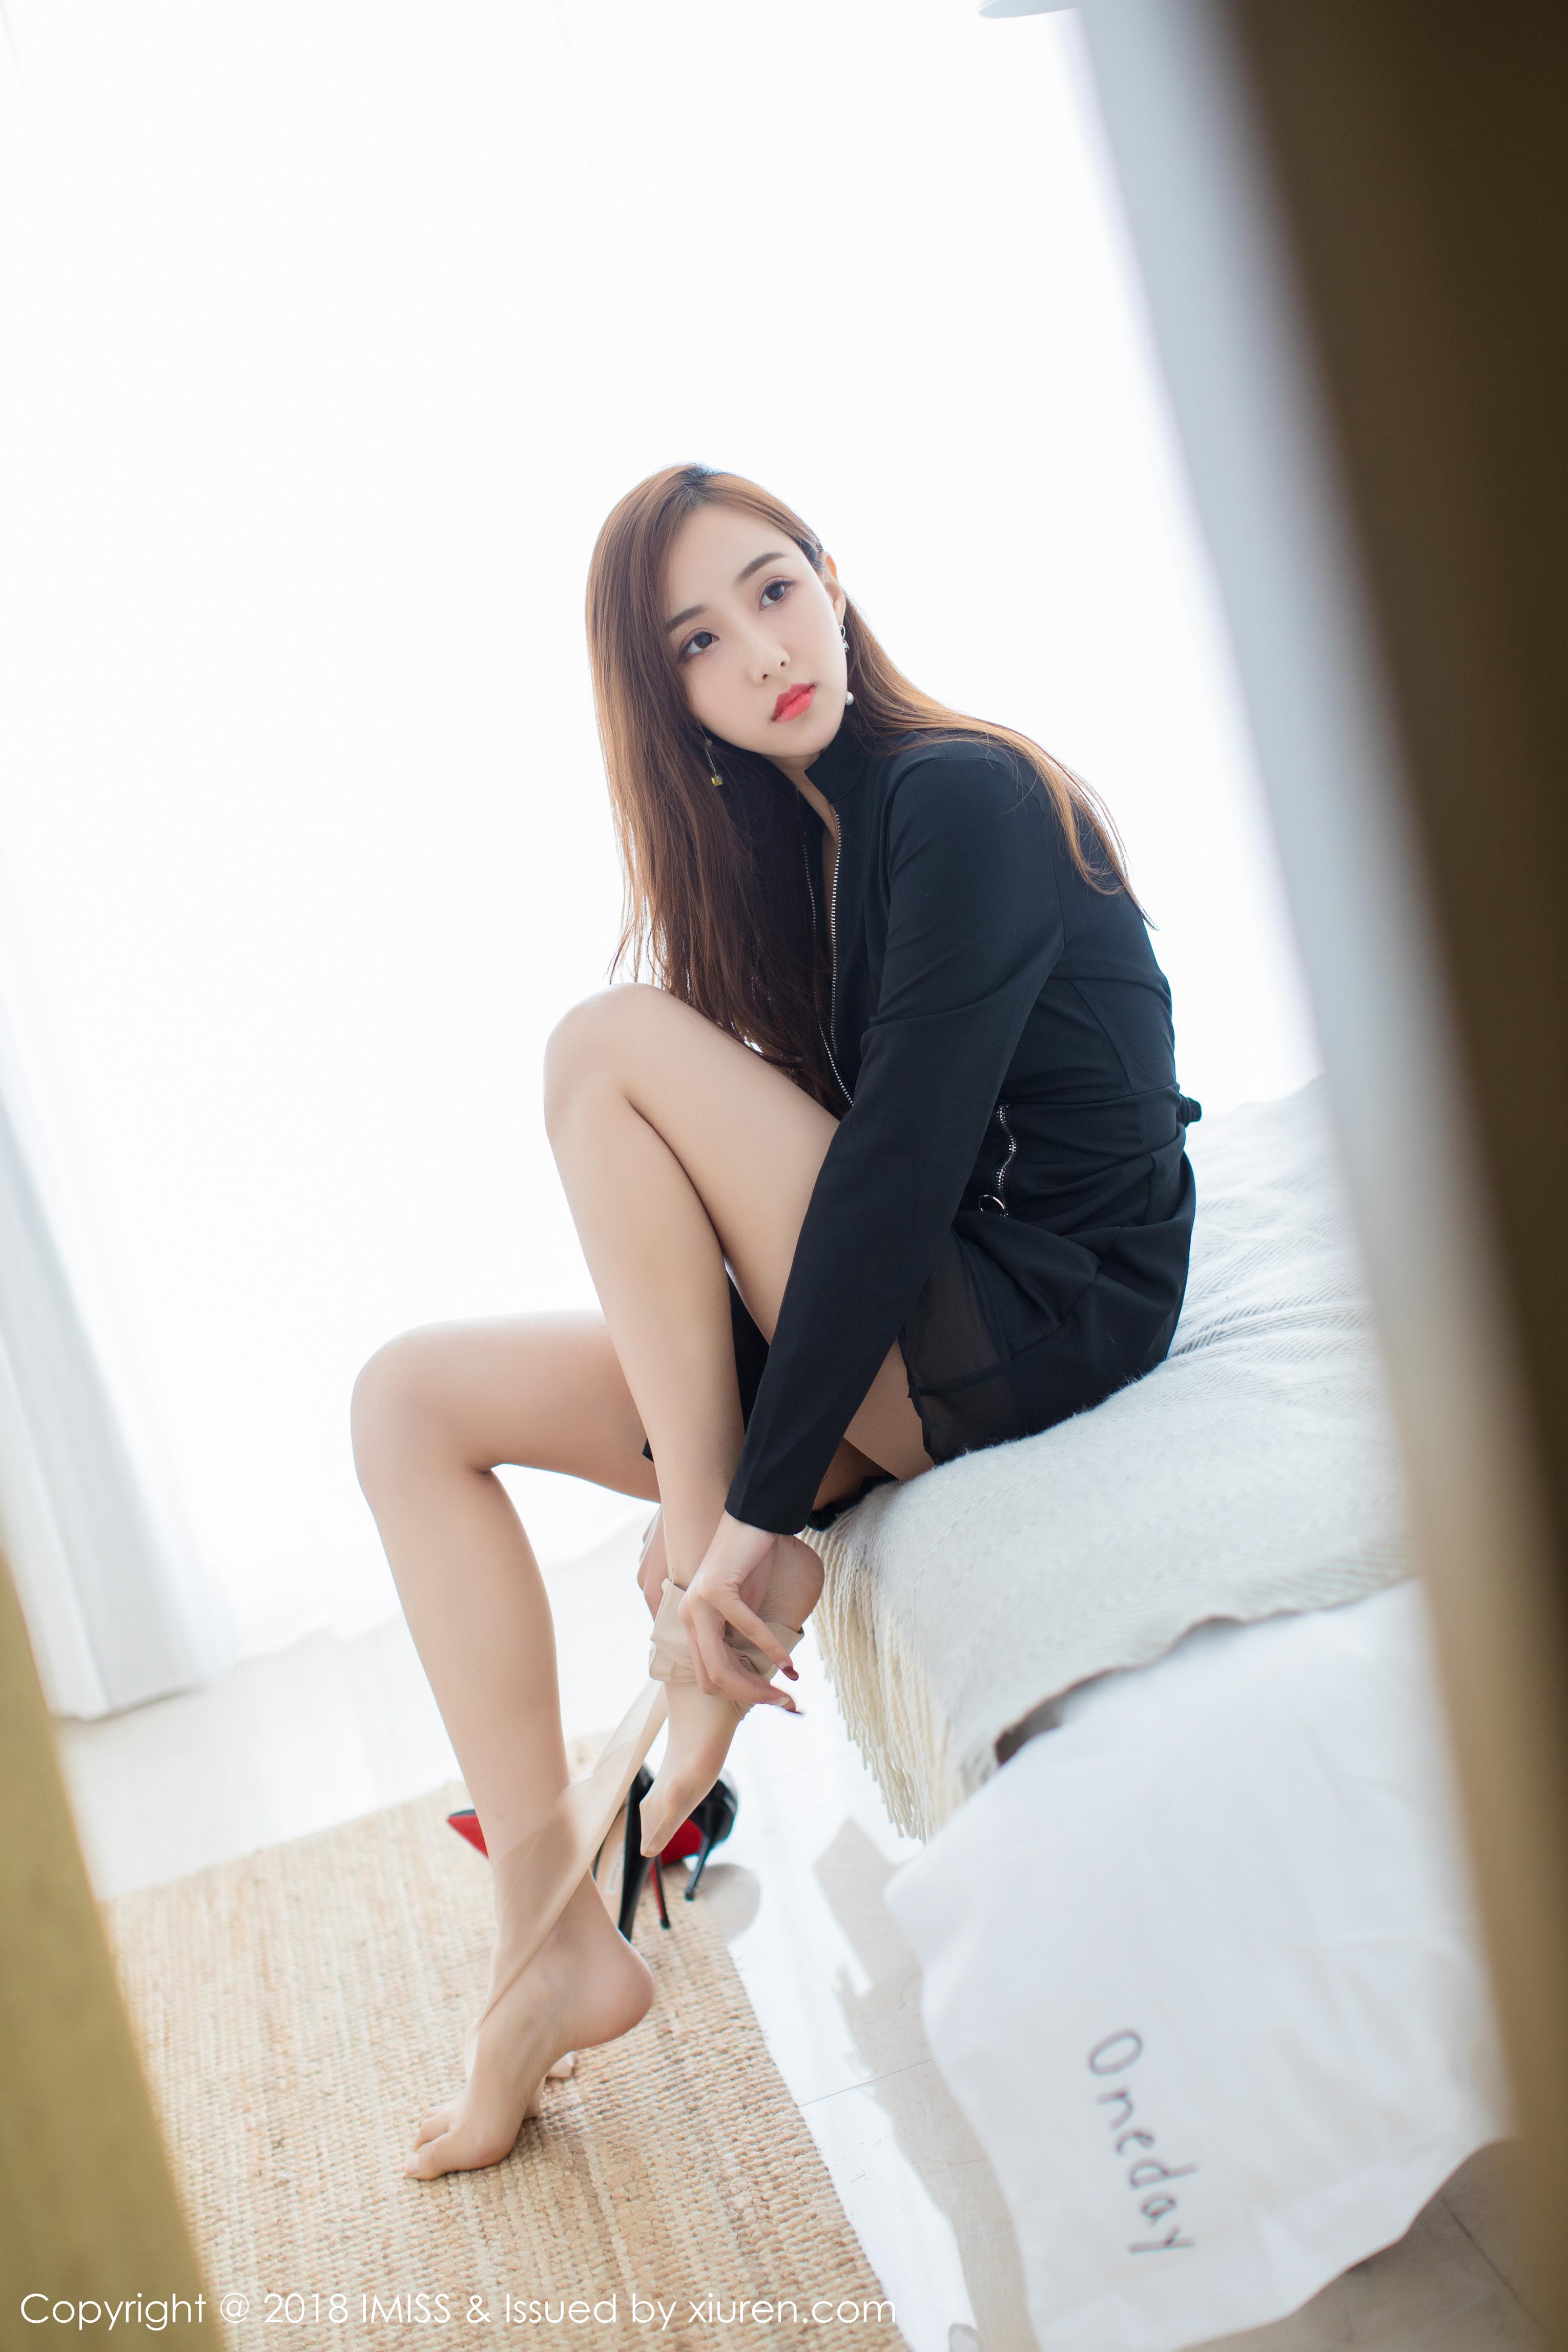 [IMISS爱蜜社]IMS20180905VOL0286 猫宝 黑色外套与黑色透视短裙加肉色丝袜美腿性感私房写真集